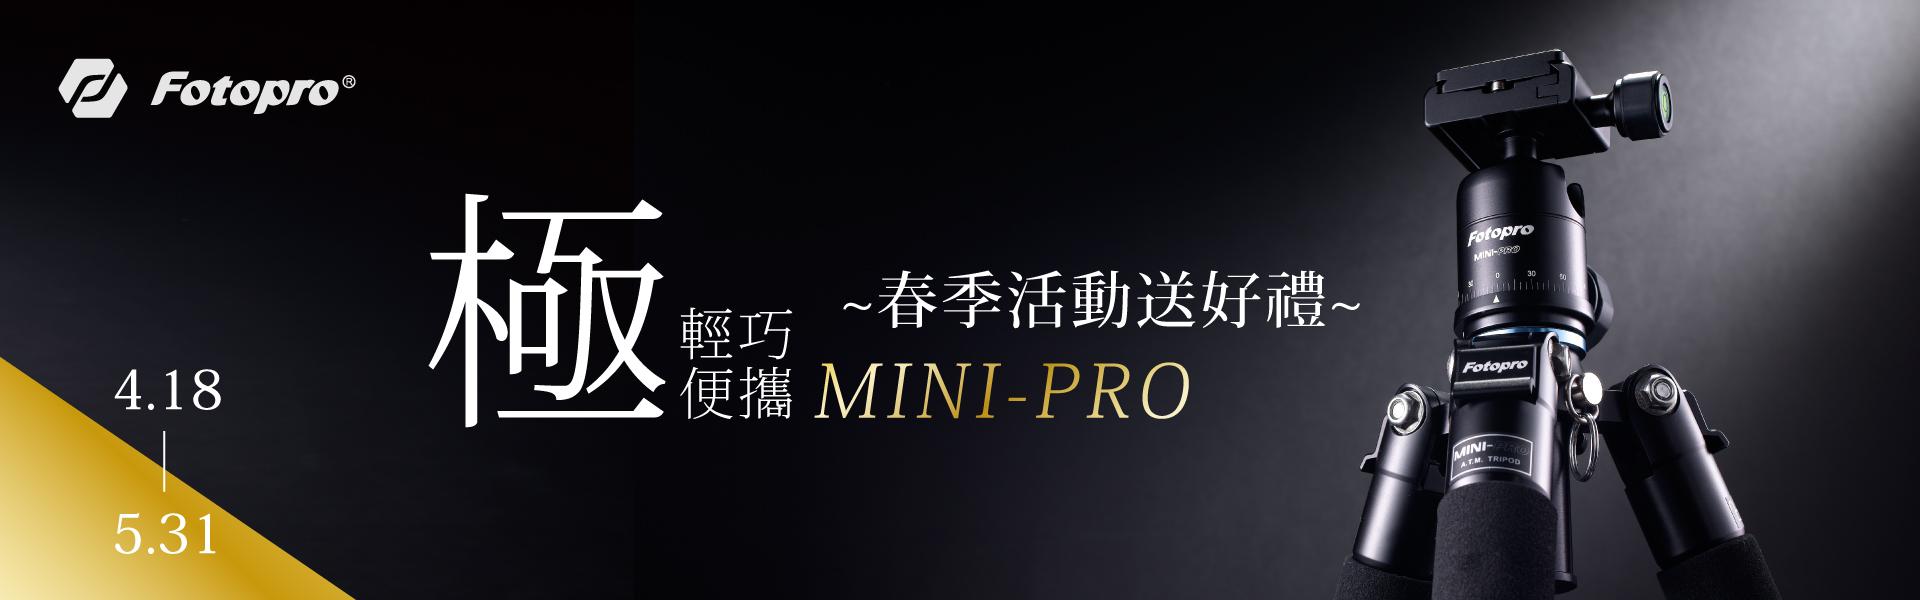 MINI-PRO~春季活動送好禮~